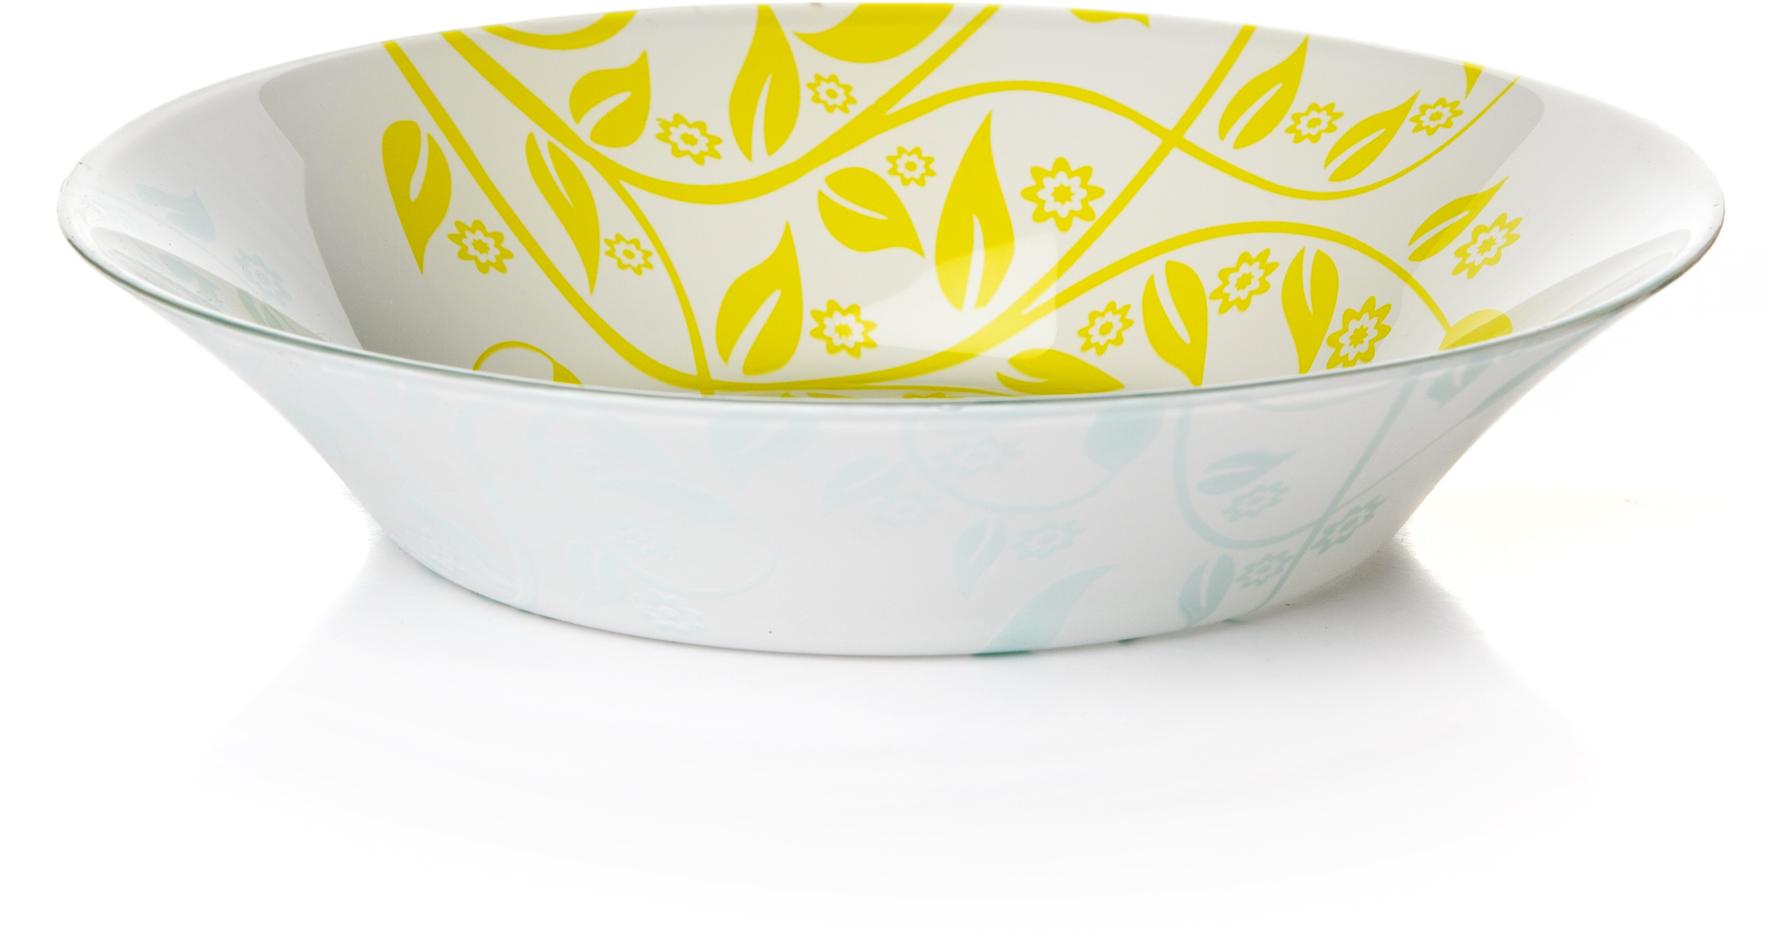 Тарелка глубокая Pasabahce Ясемин, цвет: зеленый, диаметр 22 см chkj глубокая оливковая 42 мм